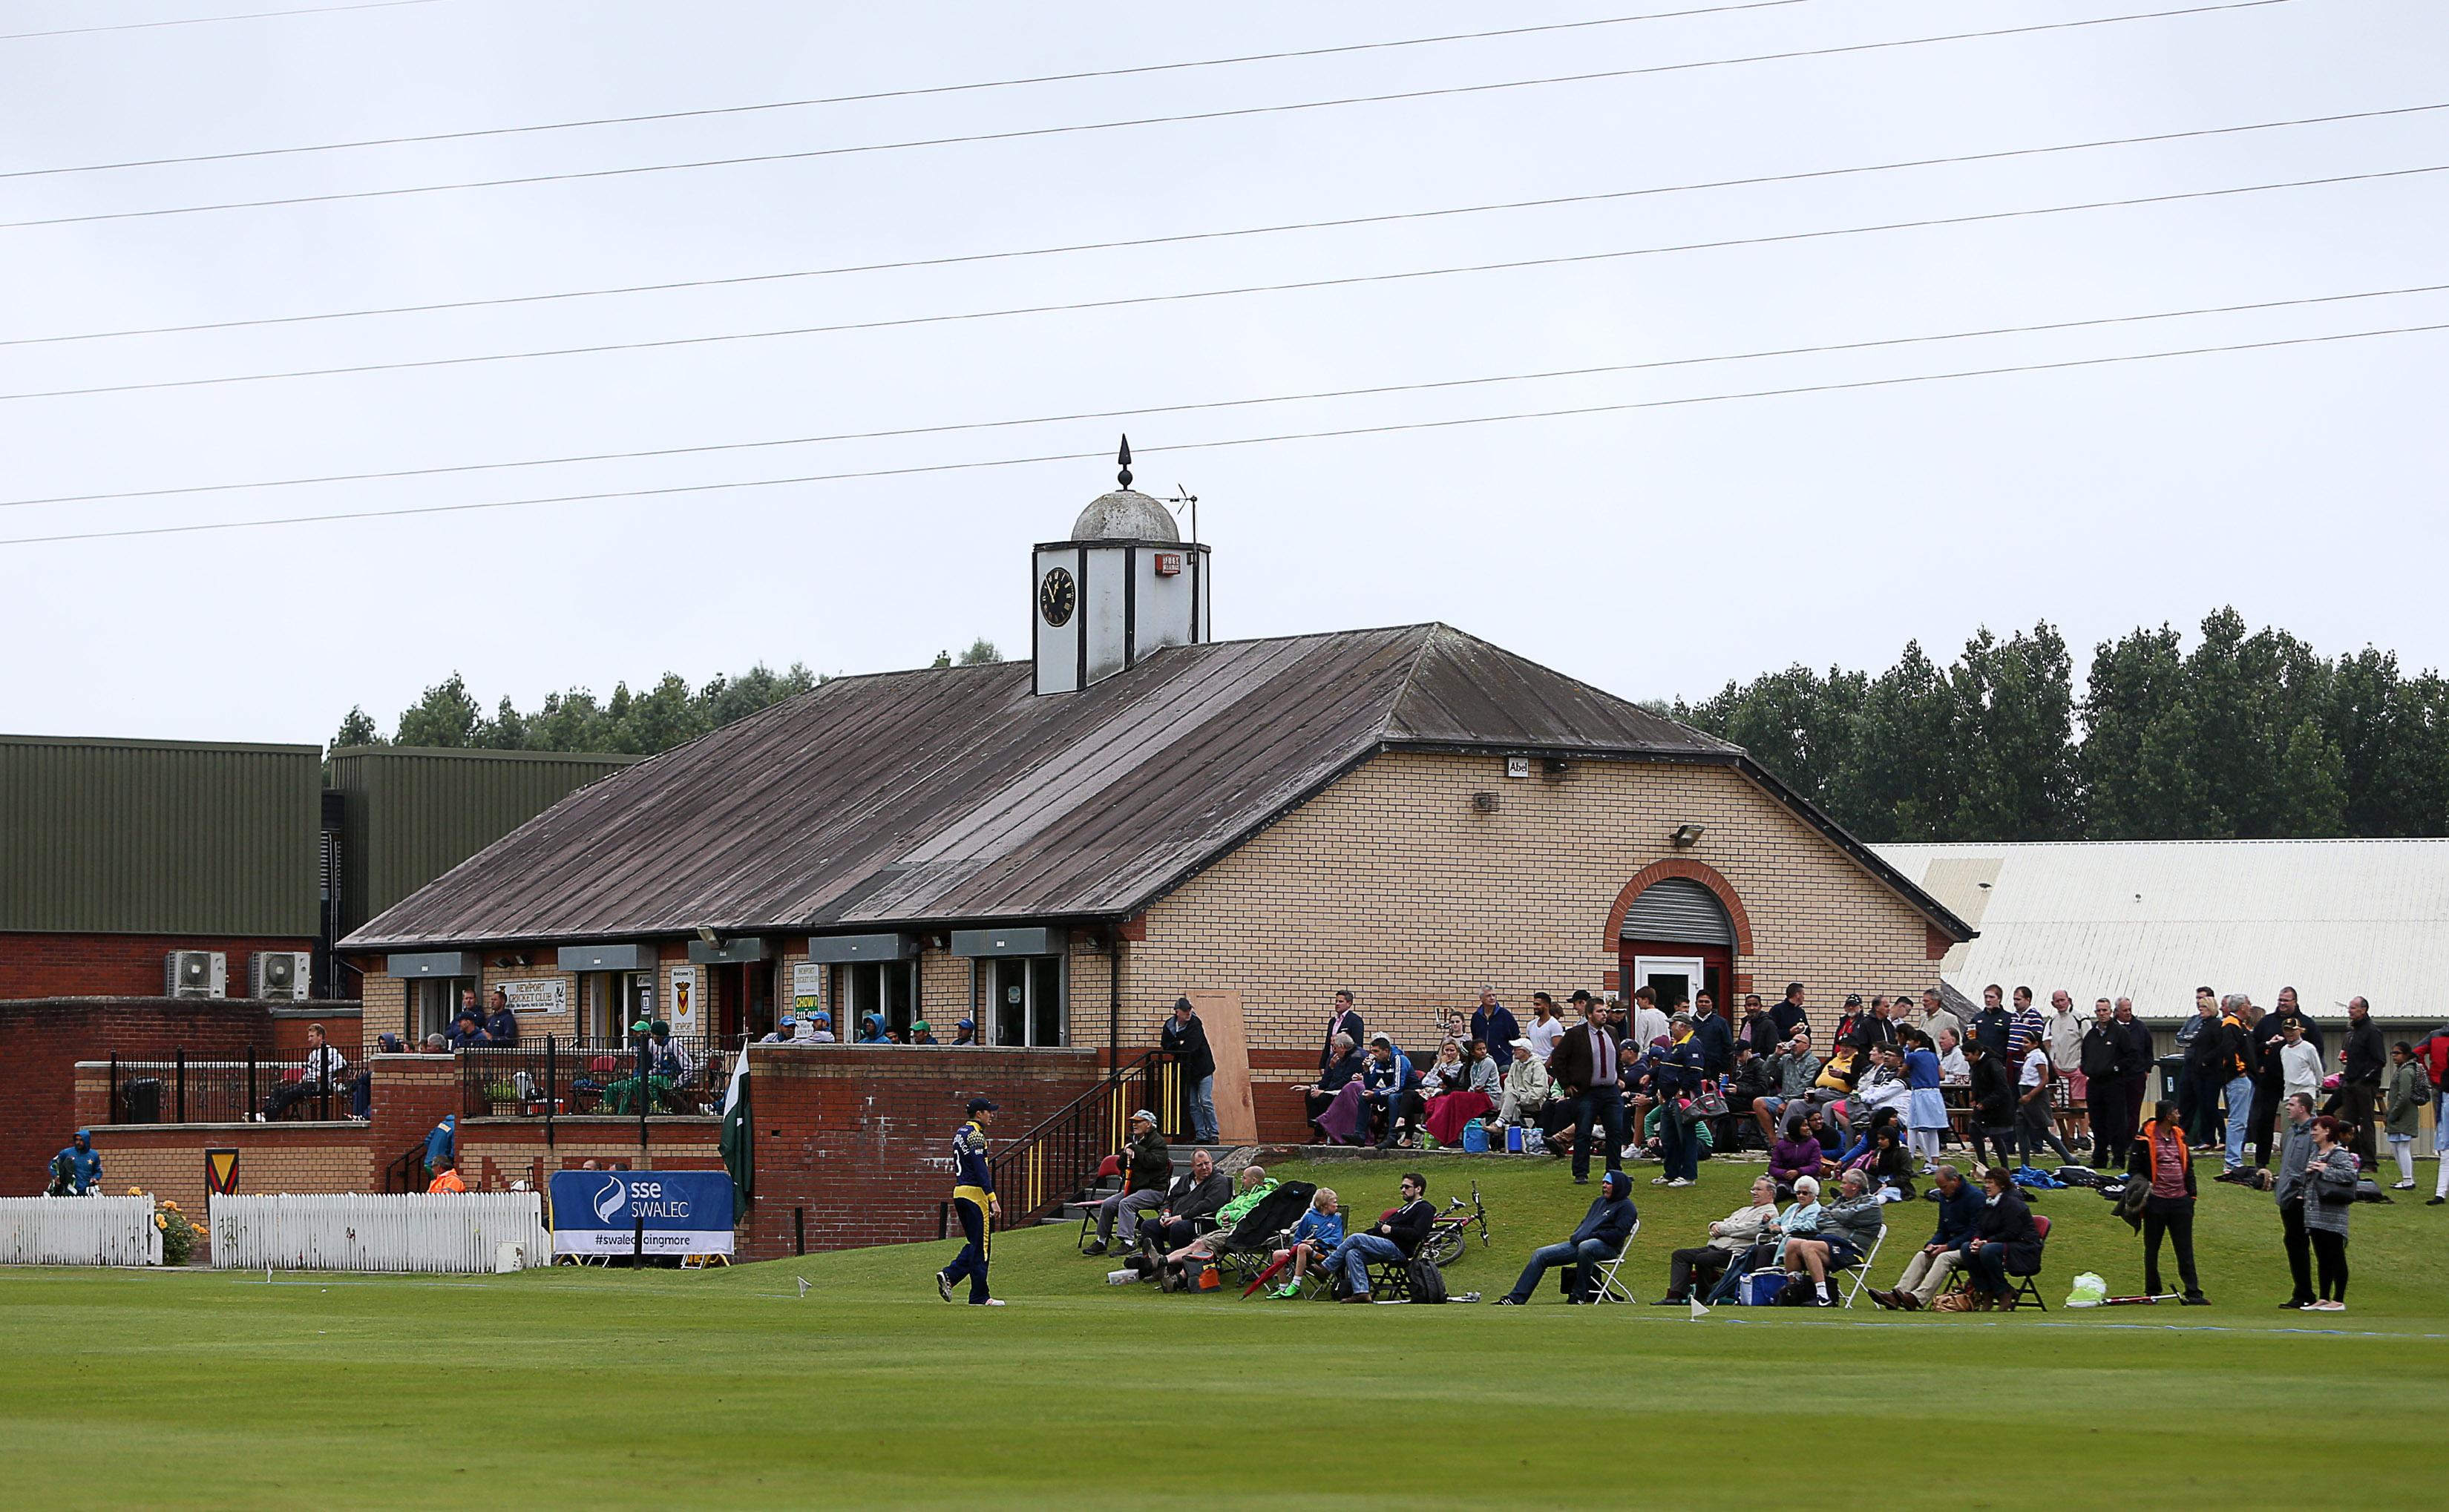 Newport Cricket Club, Spytty Park